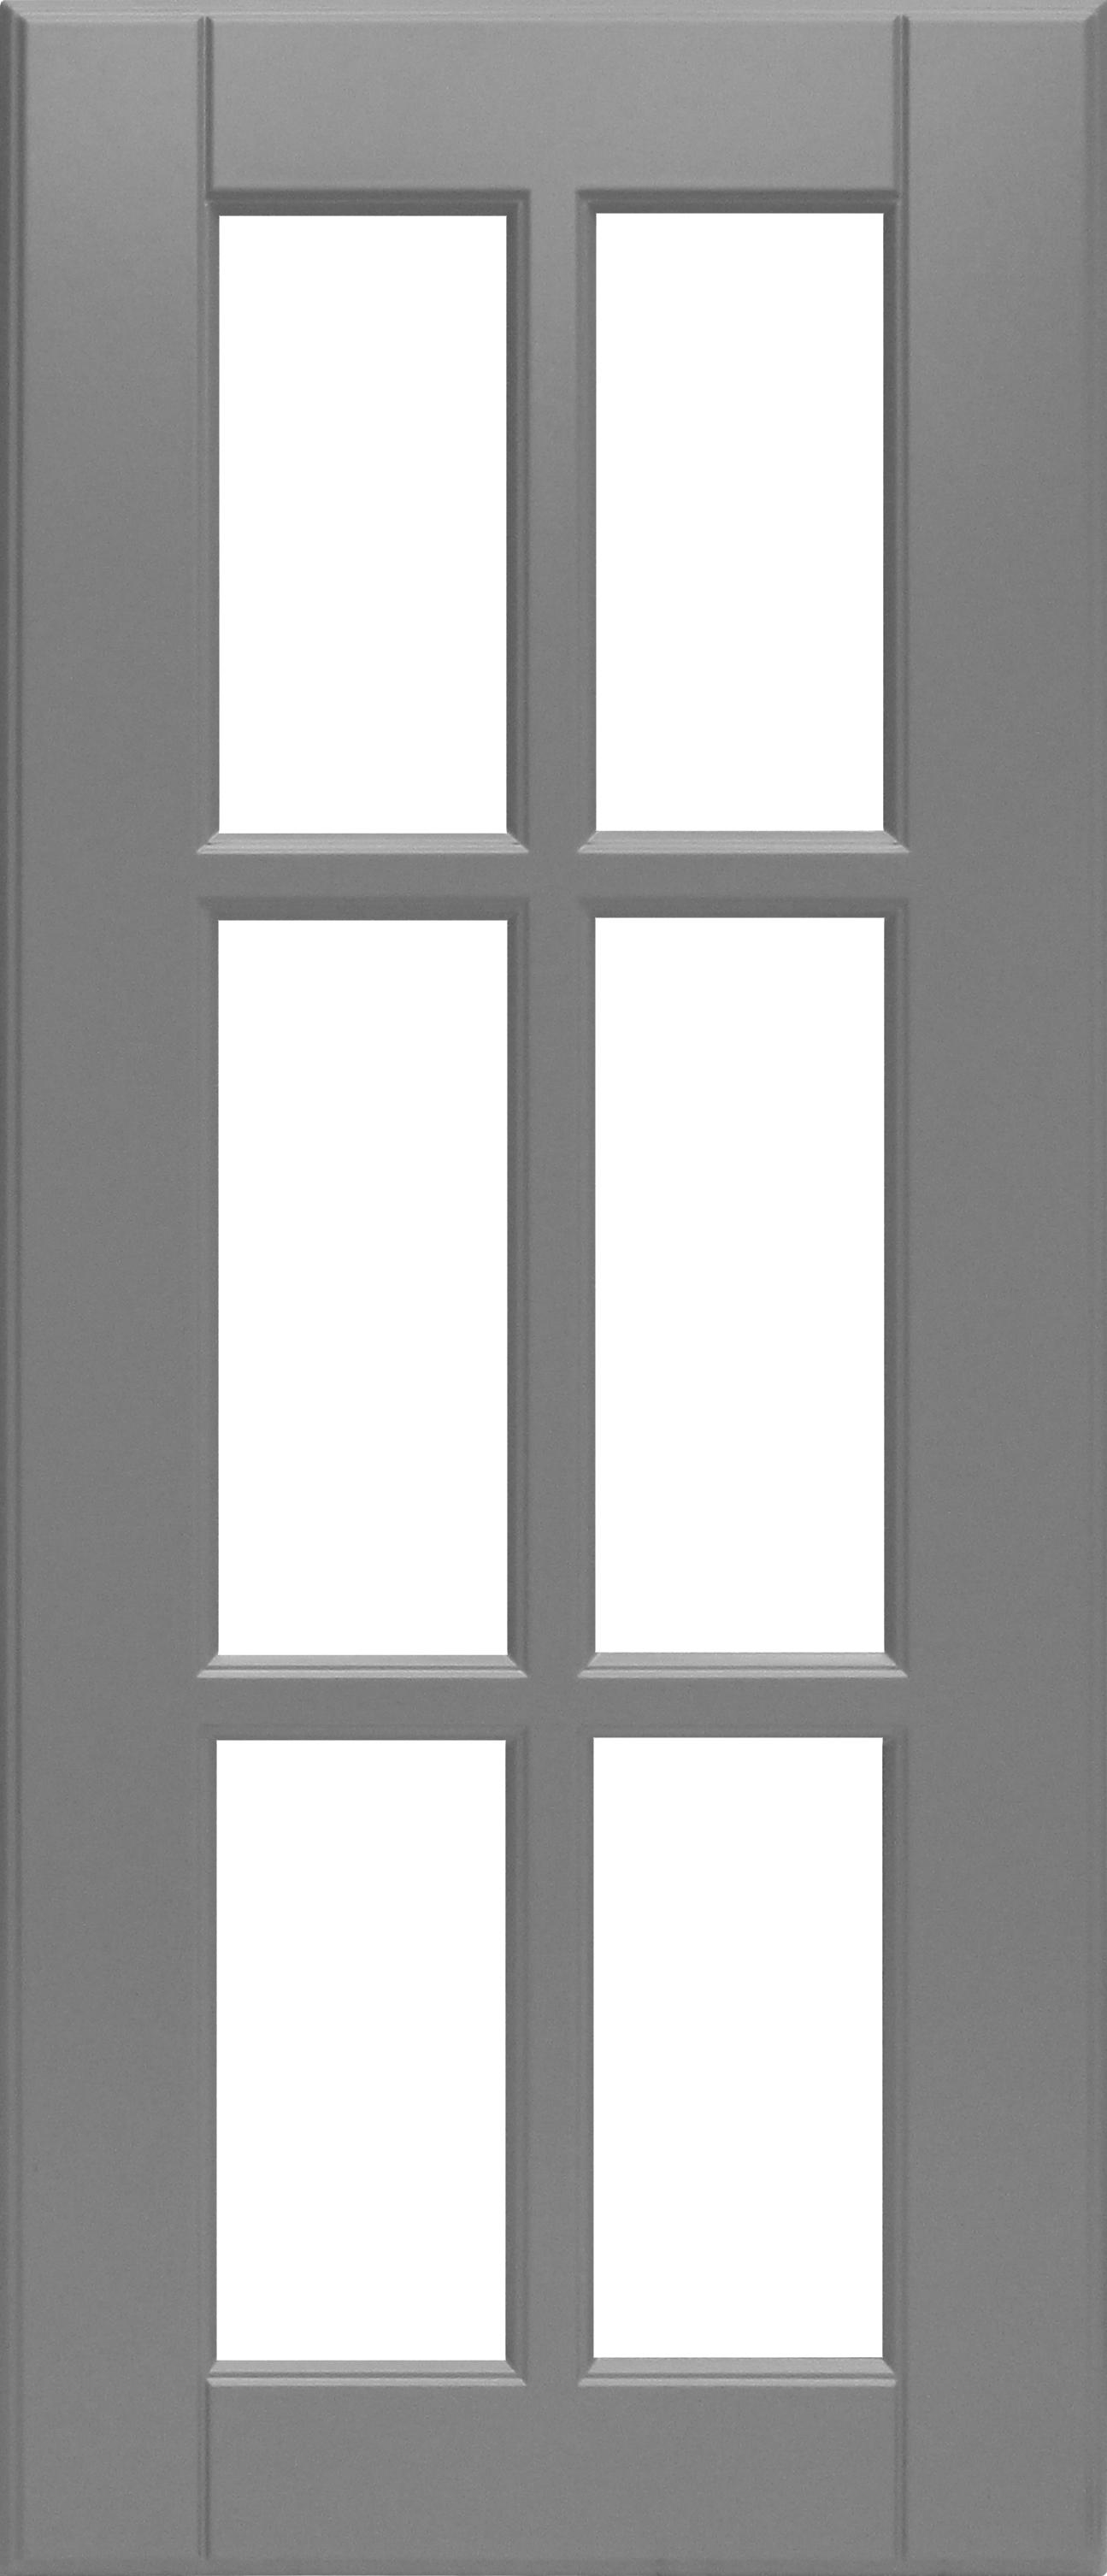 ikea lidingÖ vitrinentür küchenfront 30x70cm grau 002.206.67-00220667